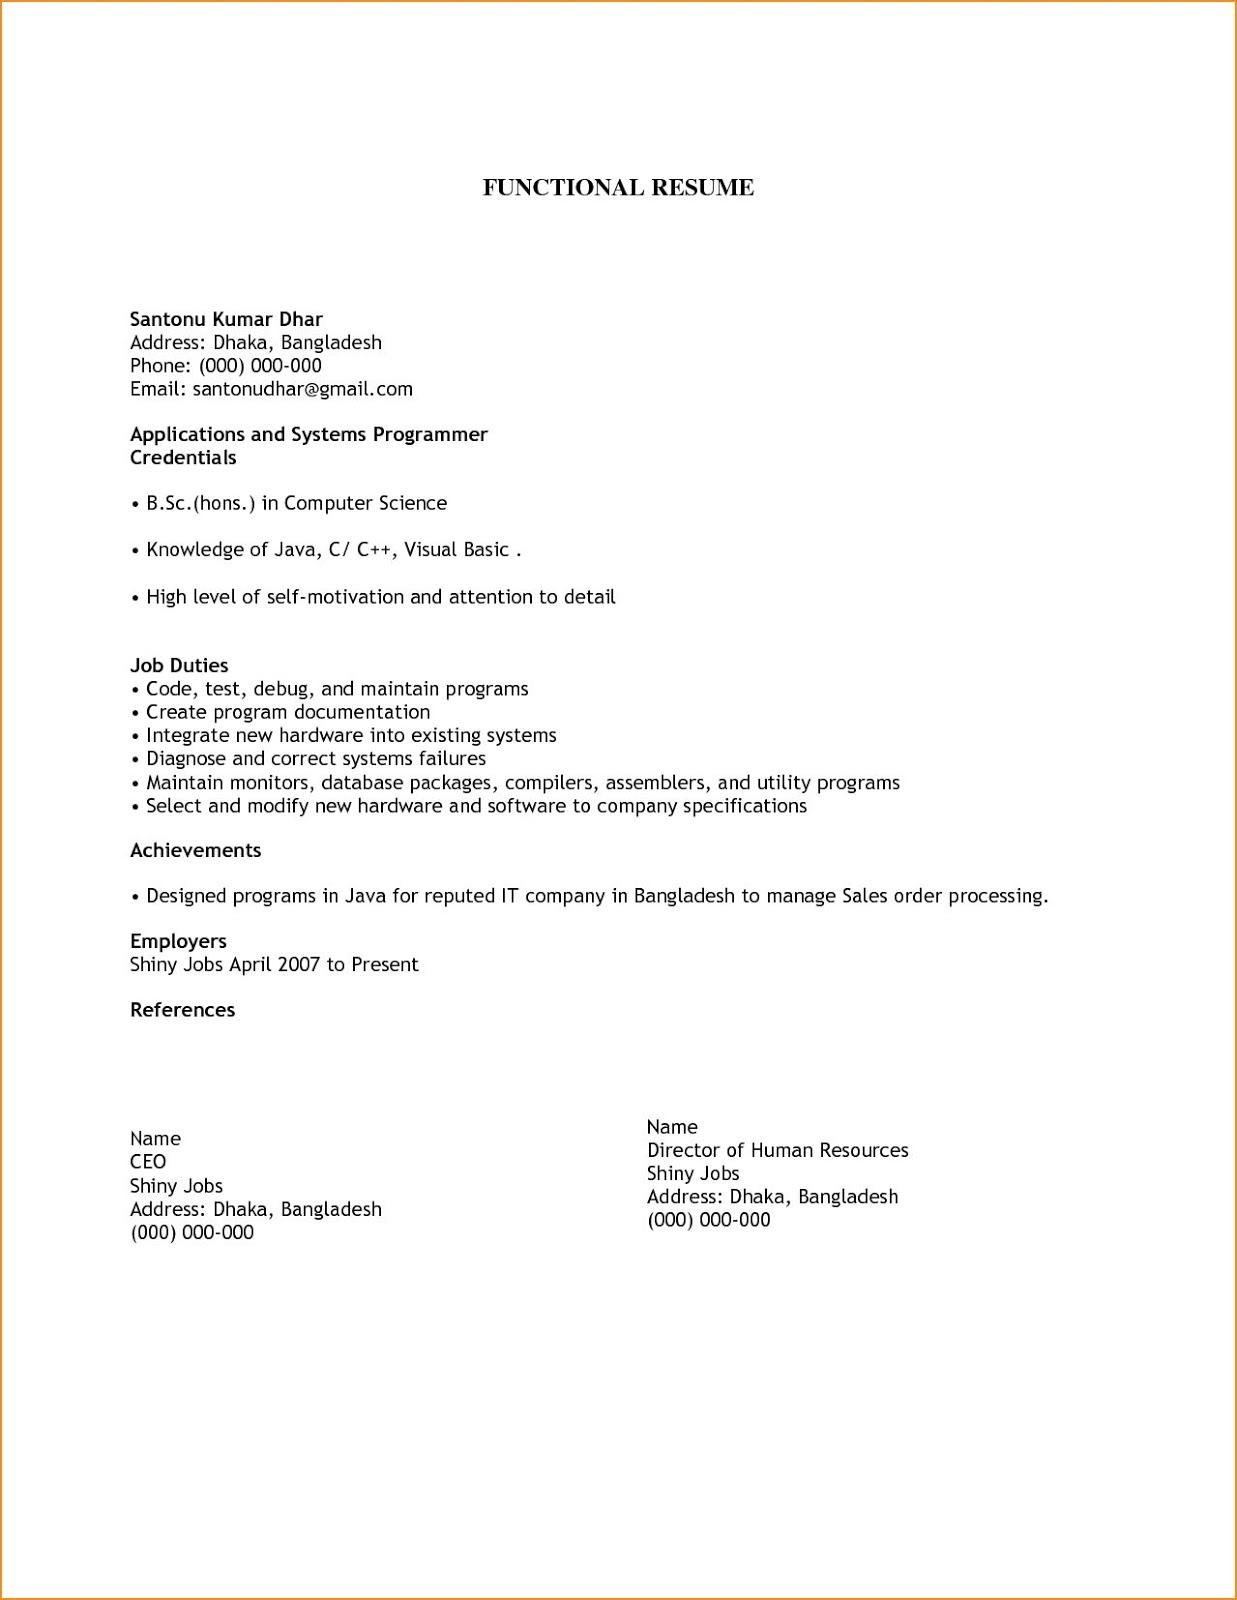 Basic Job Resume Examples 2019 Simple Job Resume Templates 2020 simple job resume examples basic job resume samples basic job resume objective examples simple job resume samples job resume examples cashier job resume examples for students job resume examples for college students job resume examples for high school